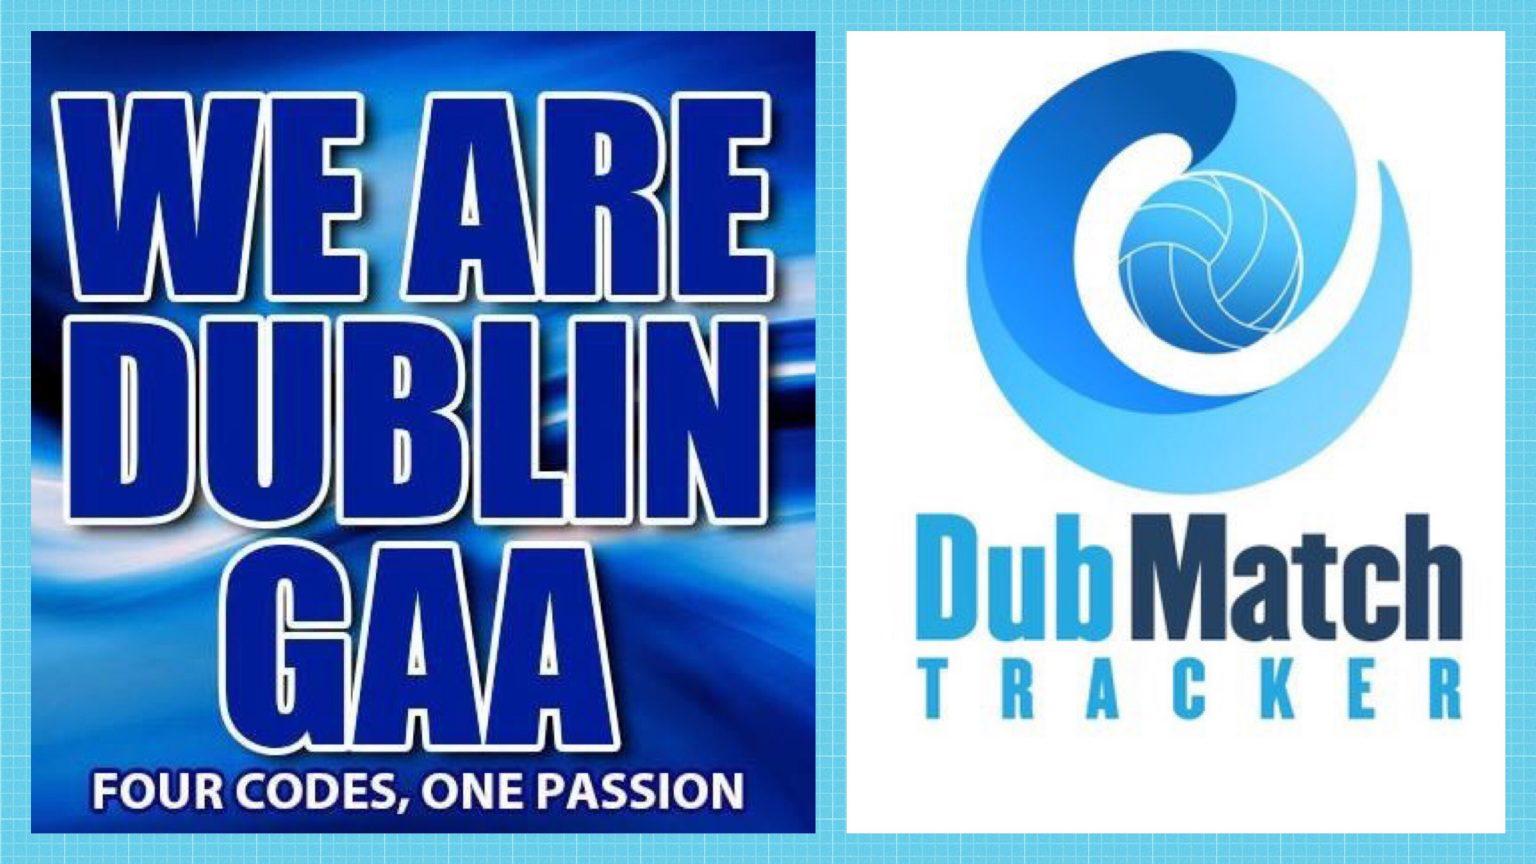 Logos Of We Are Dublin GAA and Dub Match Tracker